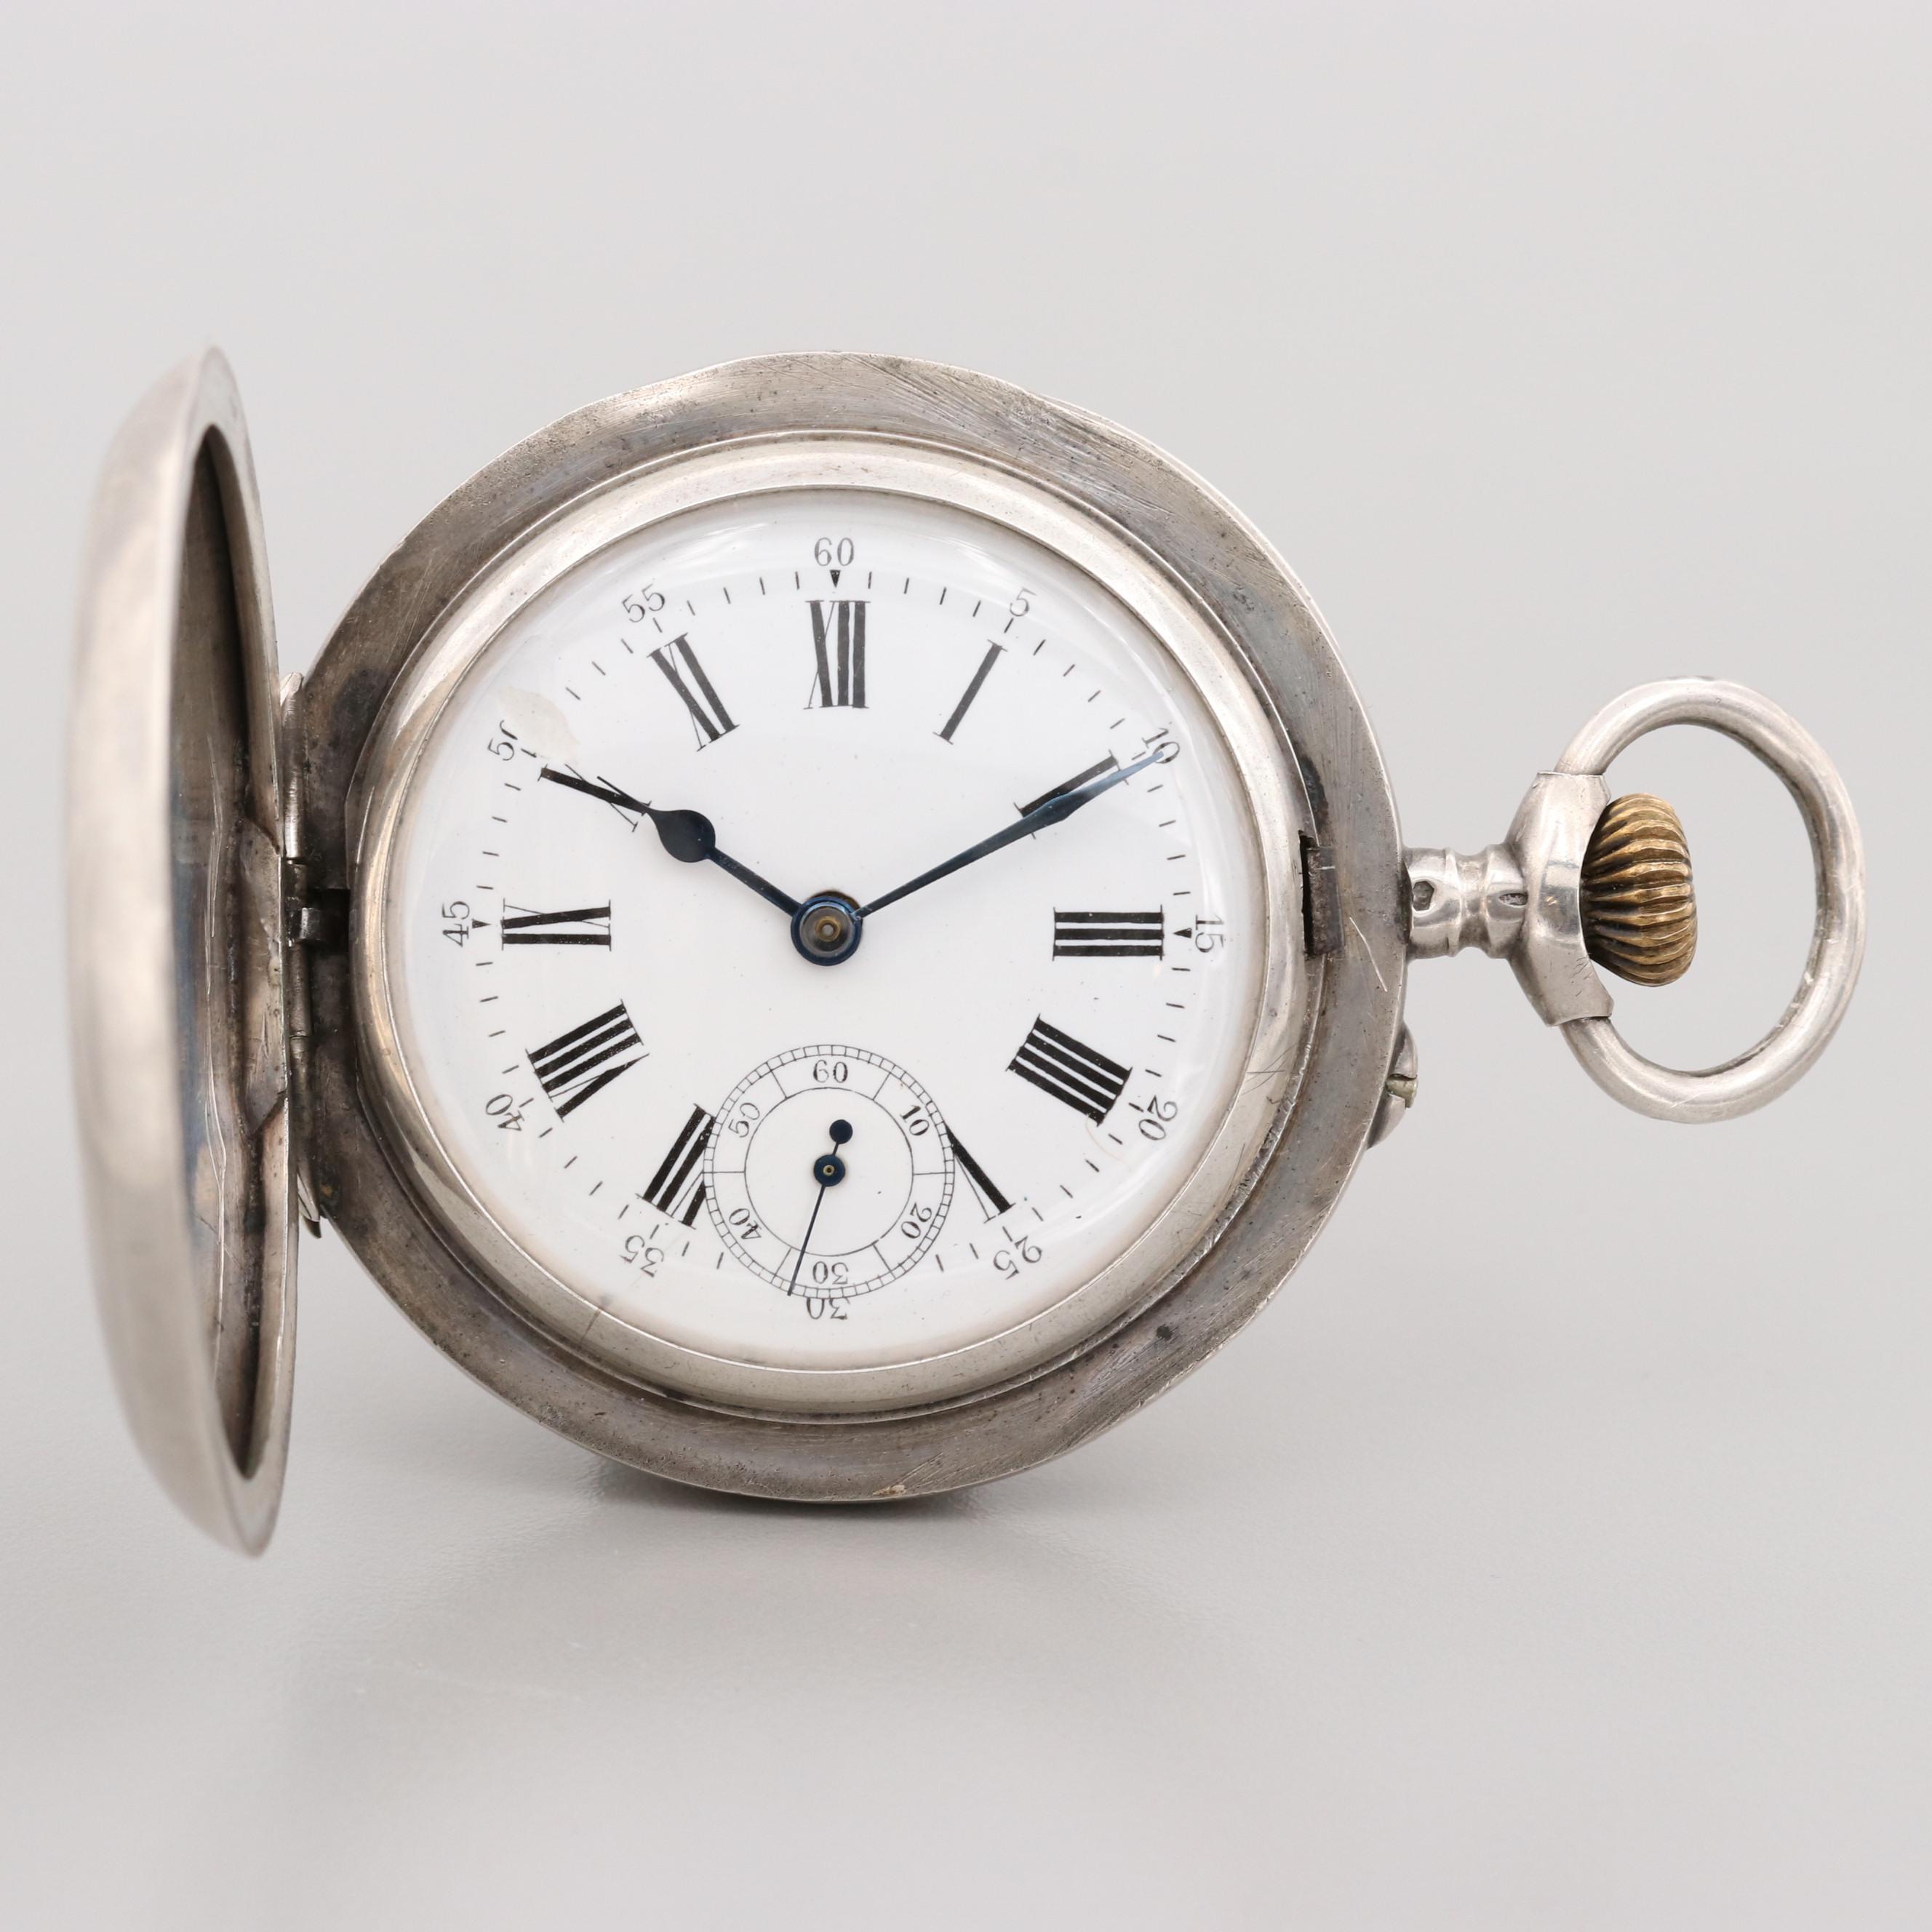 Vintage 875 Silver Hunting Case Pocket Watch